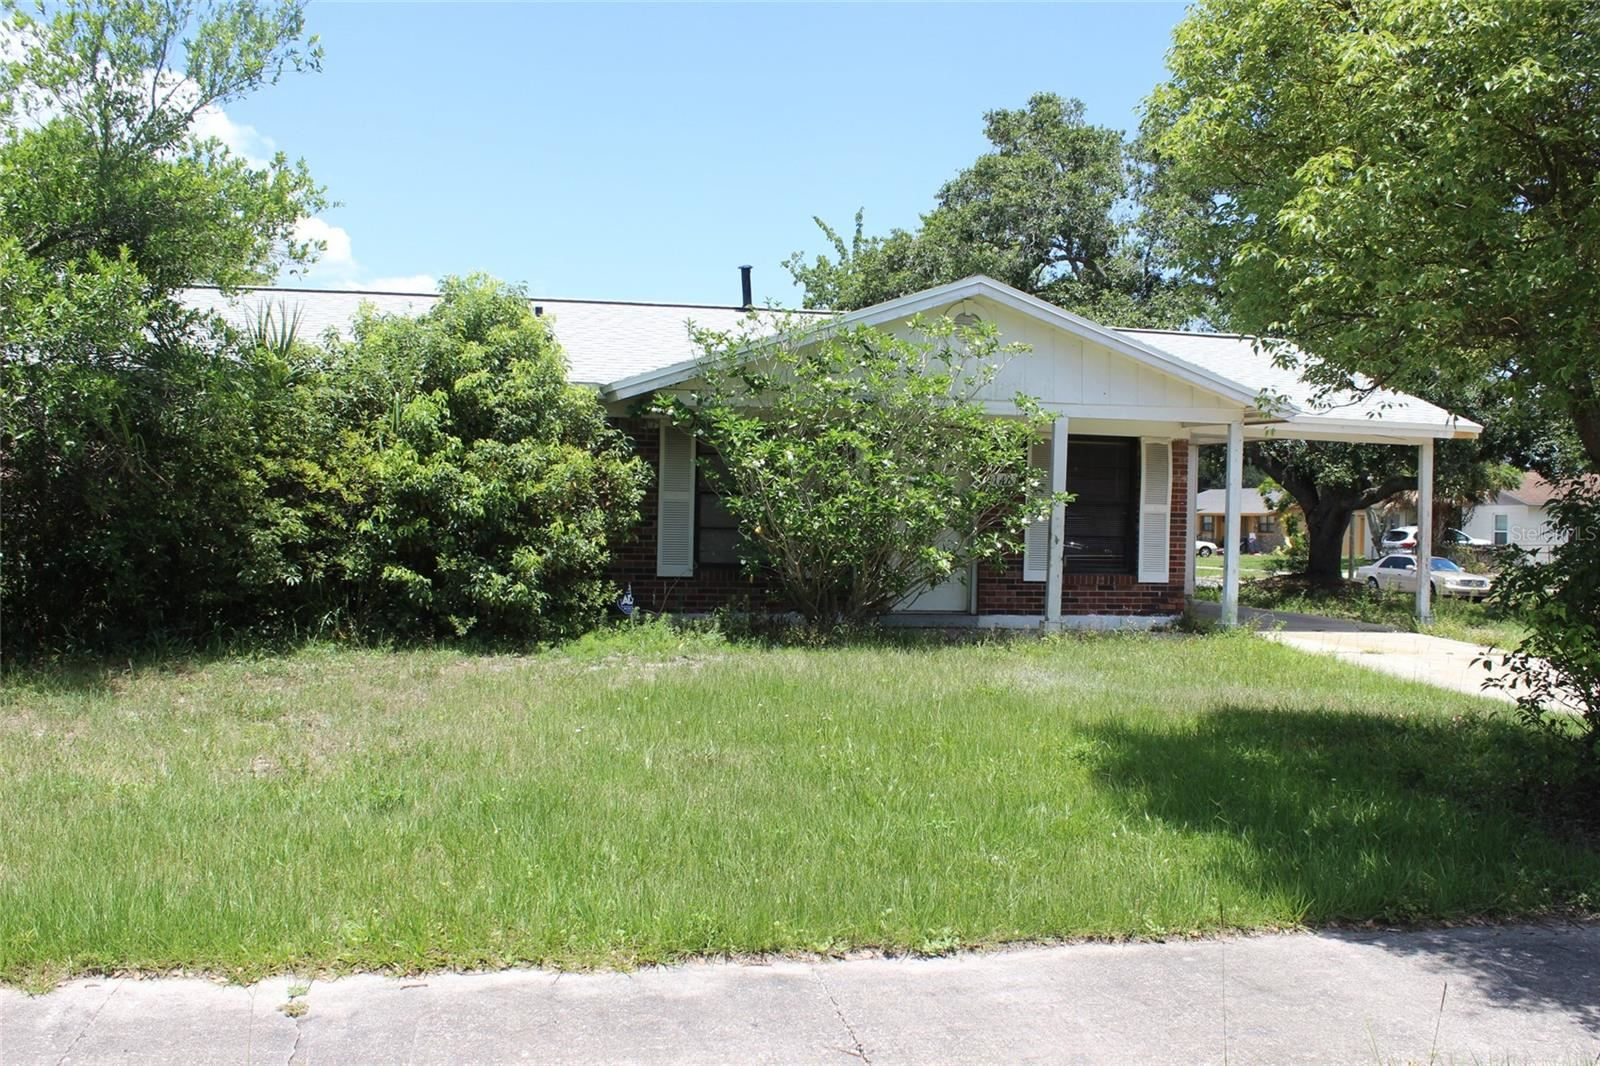 146 CARVER AVENUE, Sanford, FL 32771 - #: O5950683